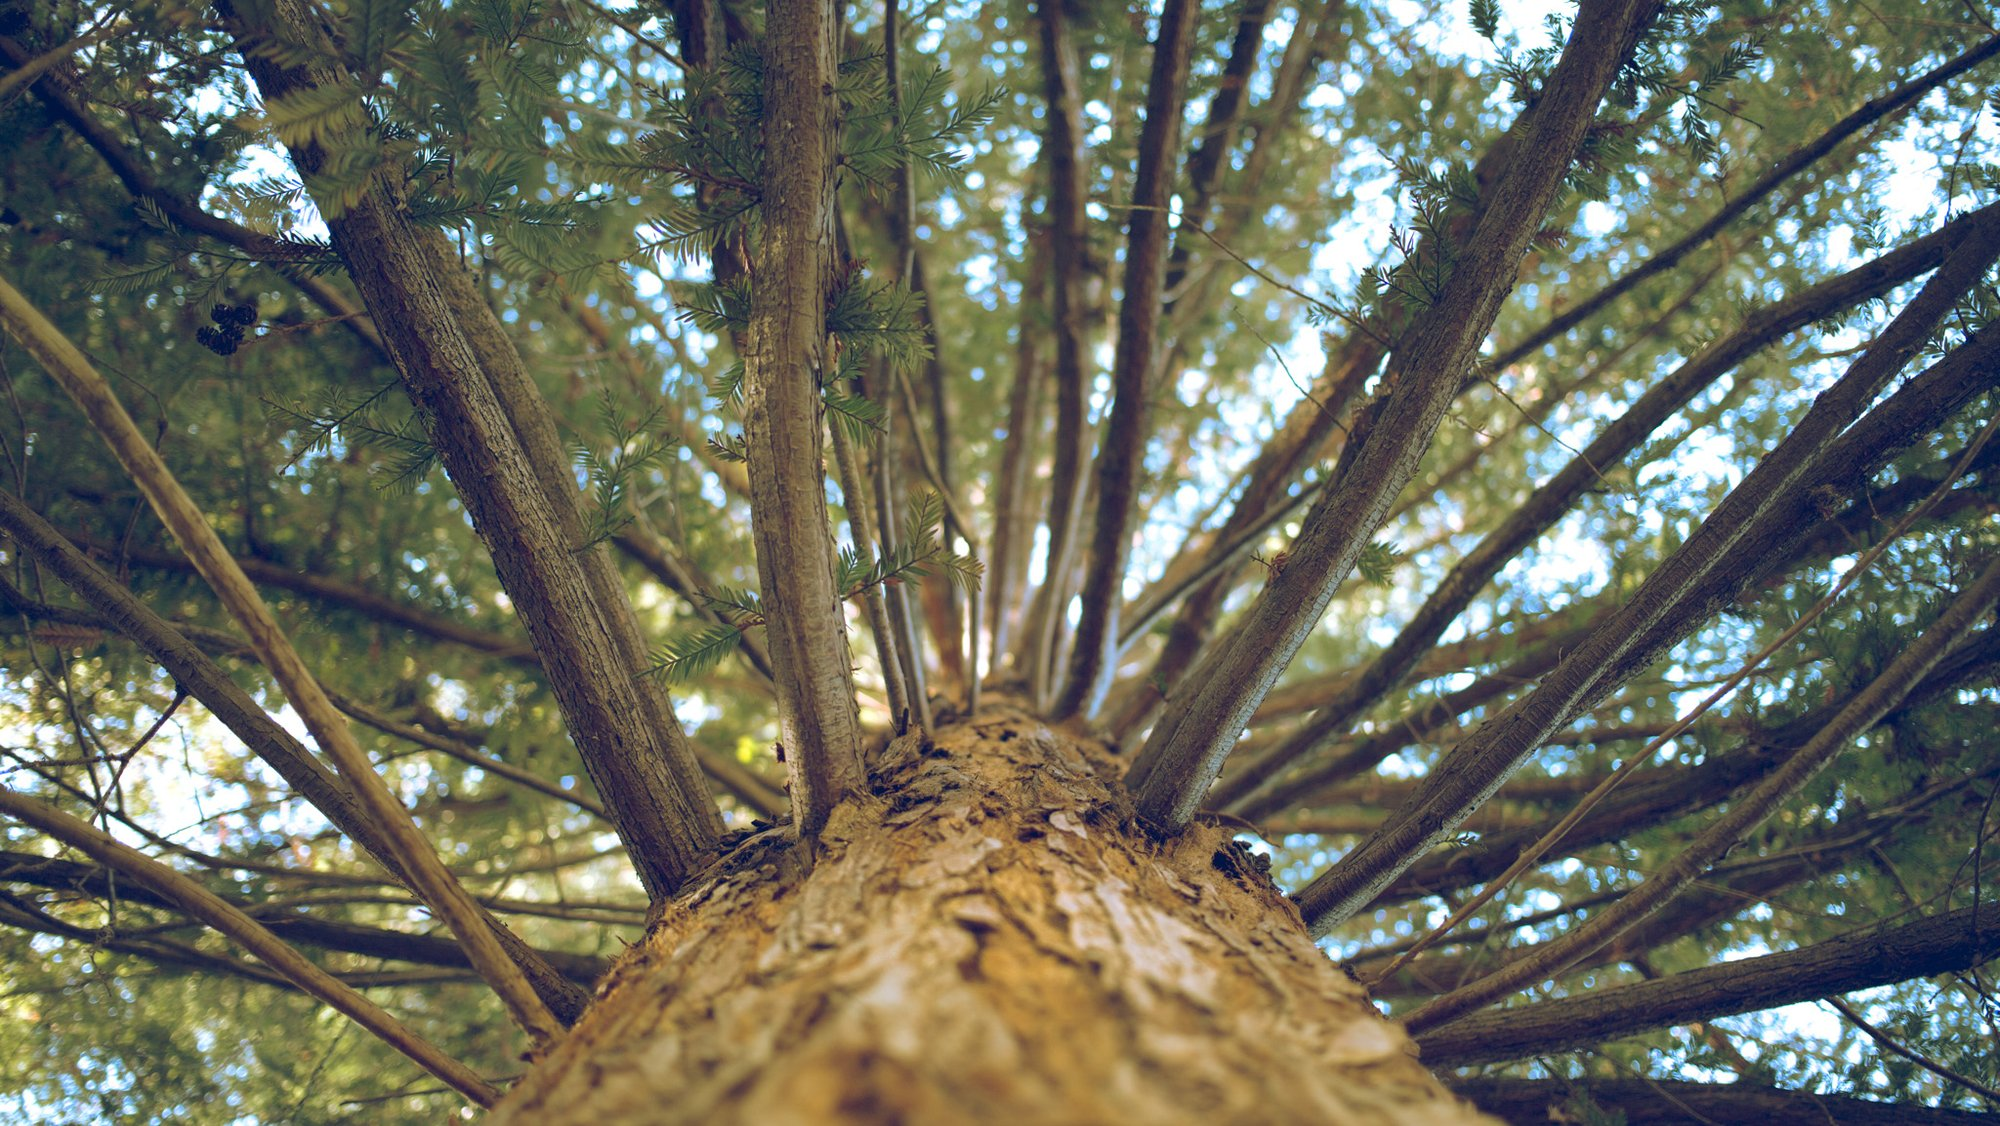 Tree photo Leo Deegan